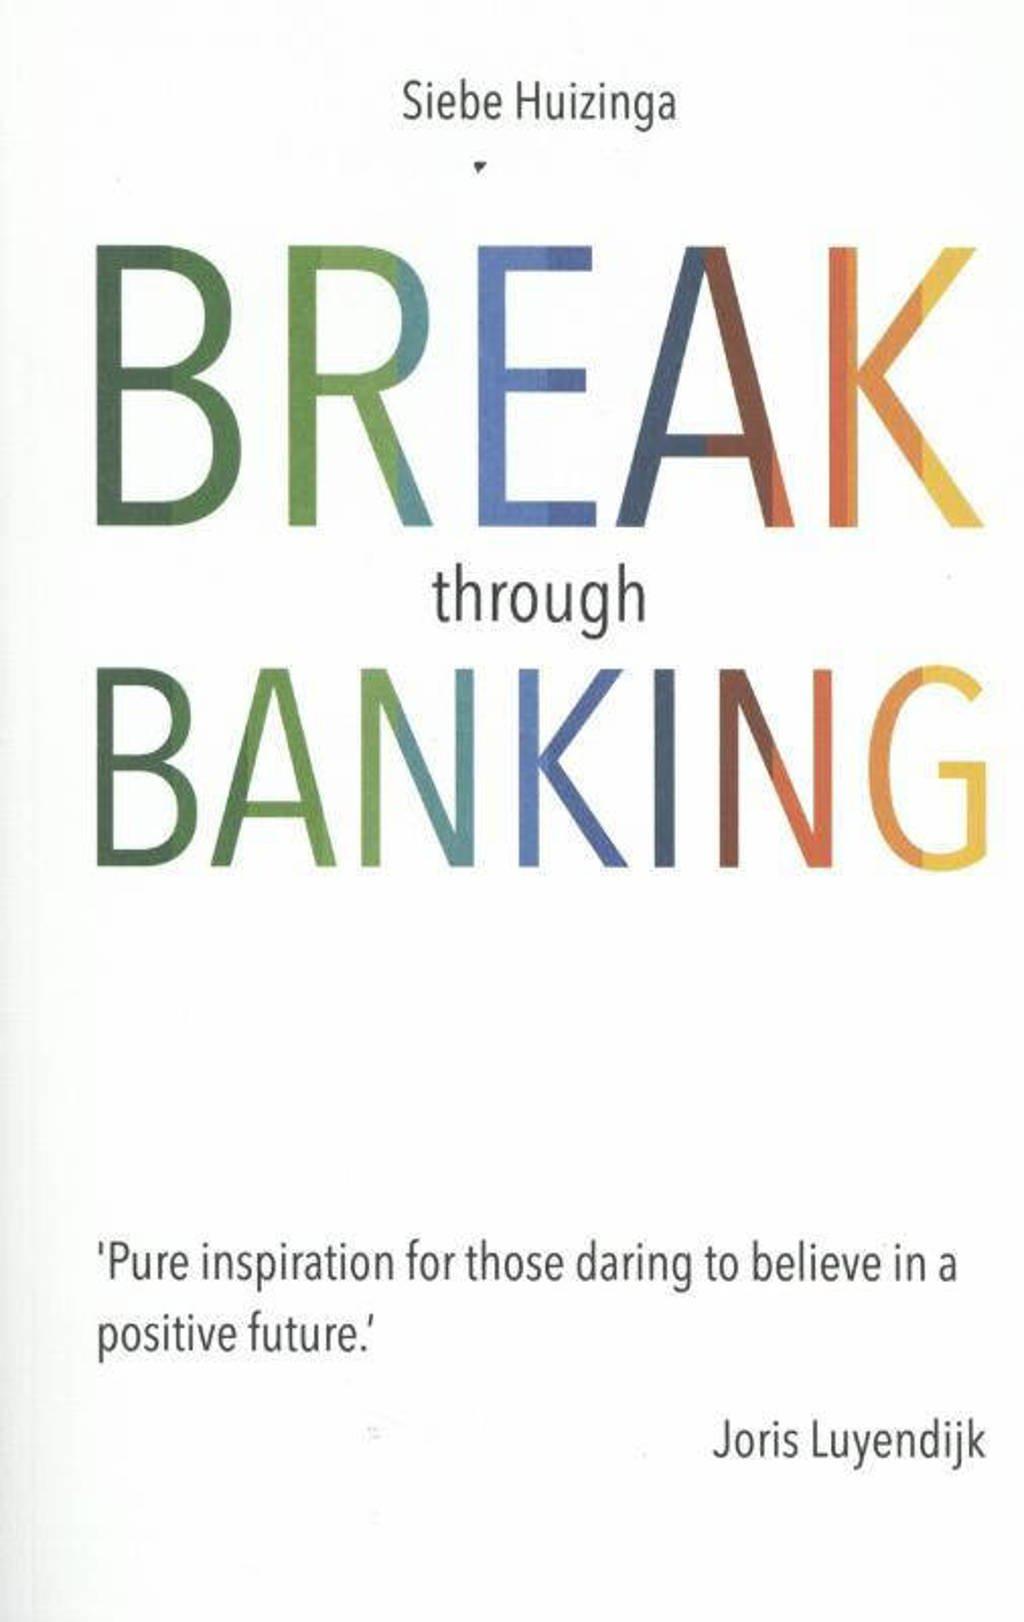 Break through banking - Siebe Huizinga